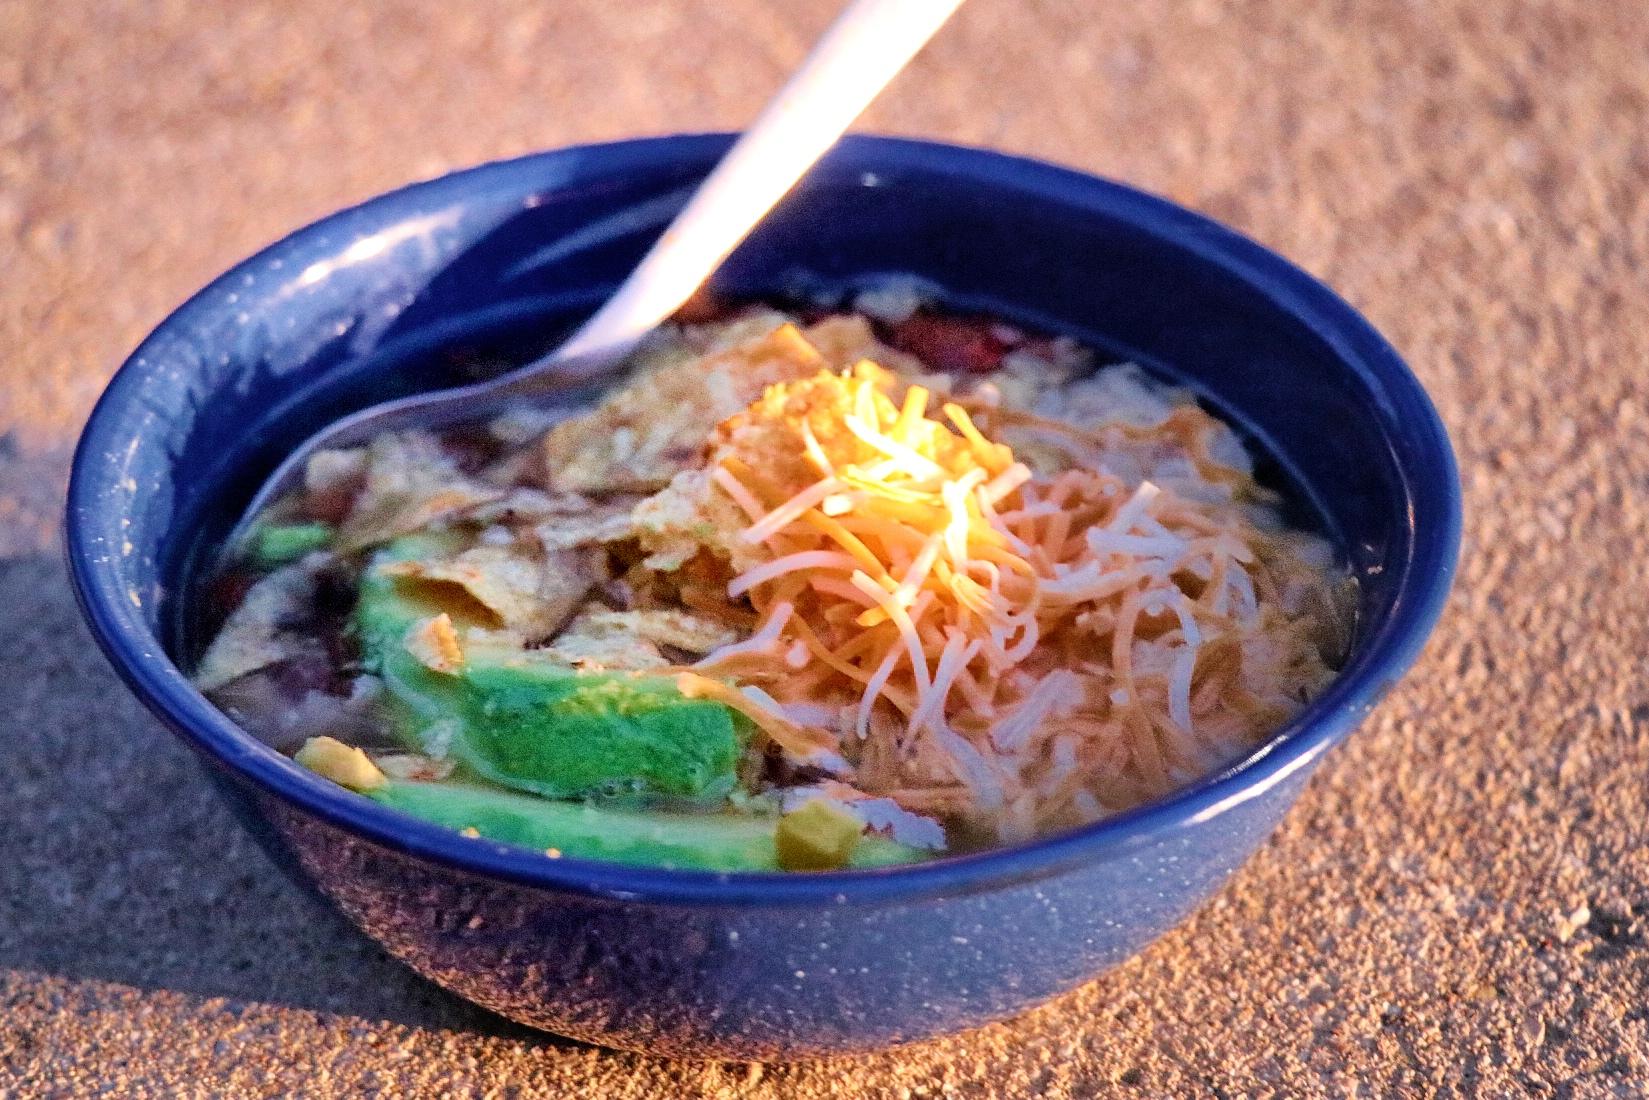 Six Can Chicken Tortilla Soup fabeverydayblog